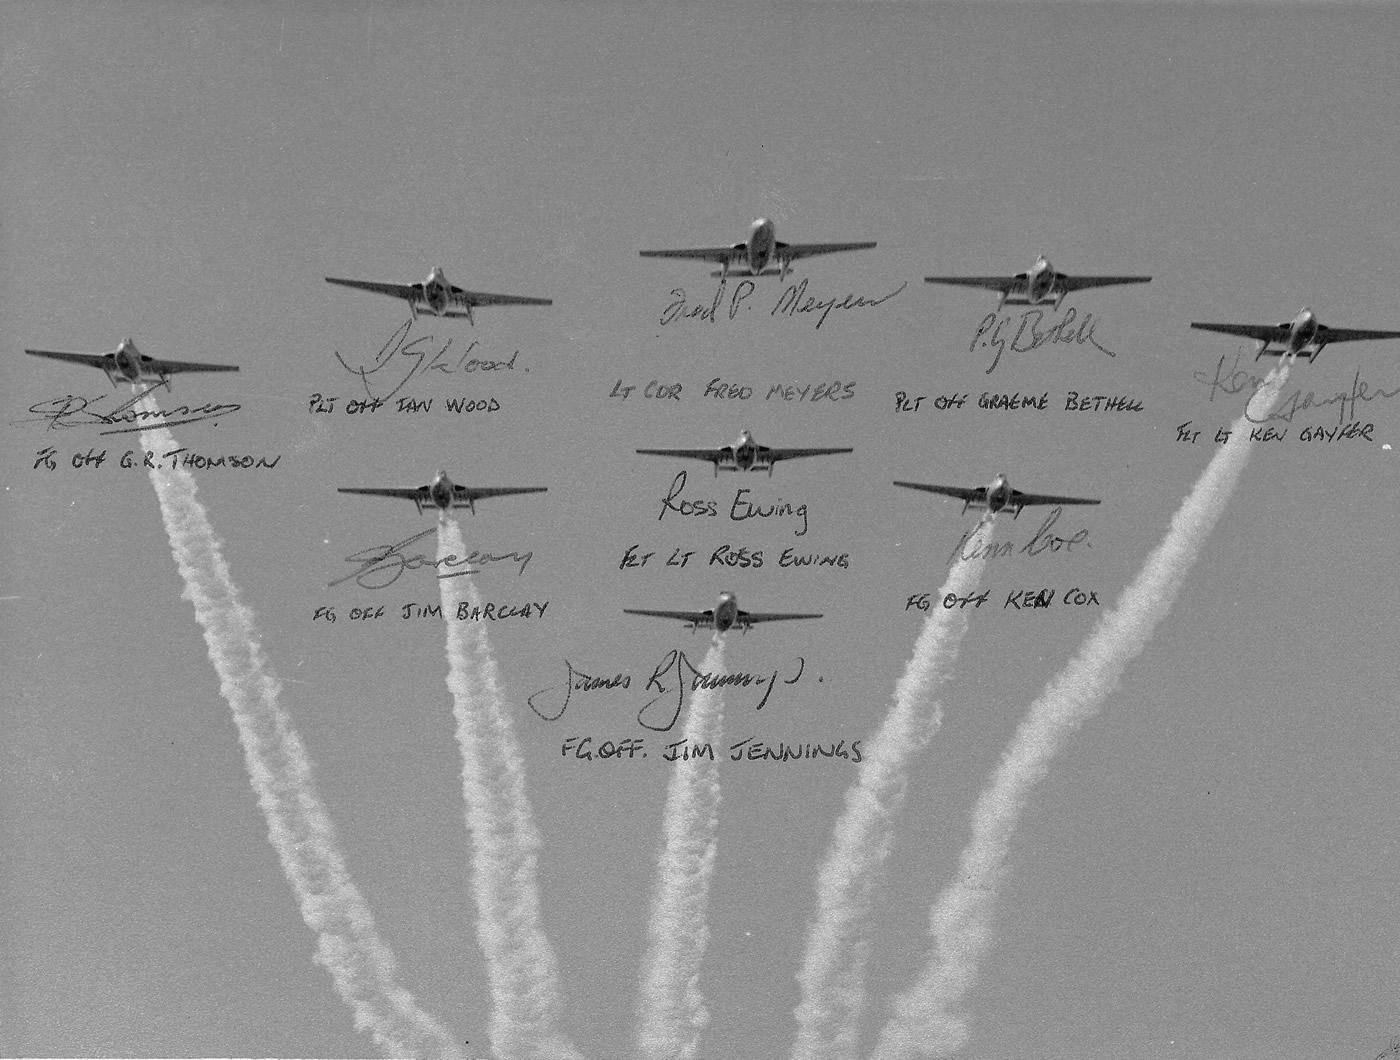 75 Sqn Diamond 9 Flypast Civic Ceremony – Gisborne – 9 Oct 69 RNZAF Photo Small